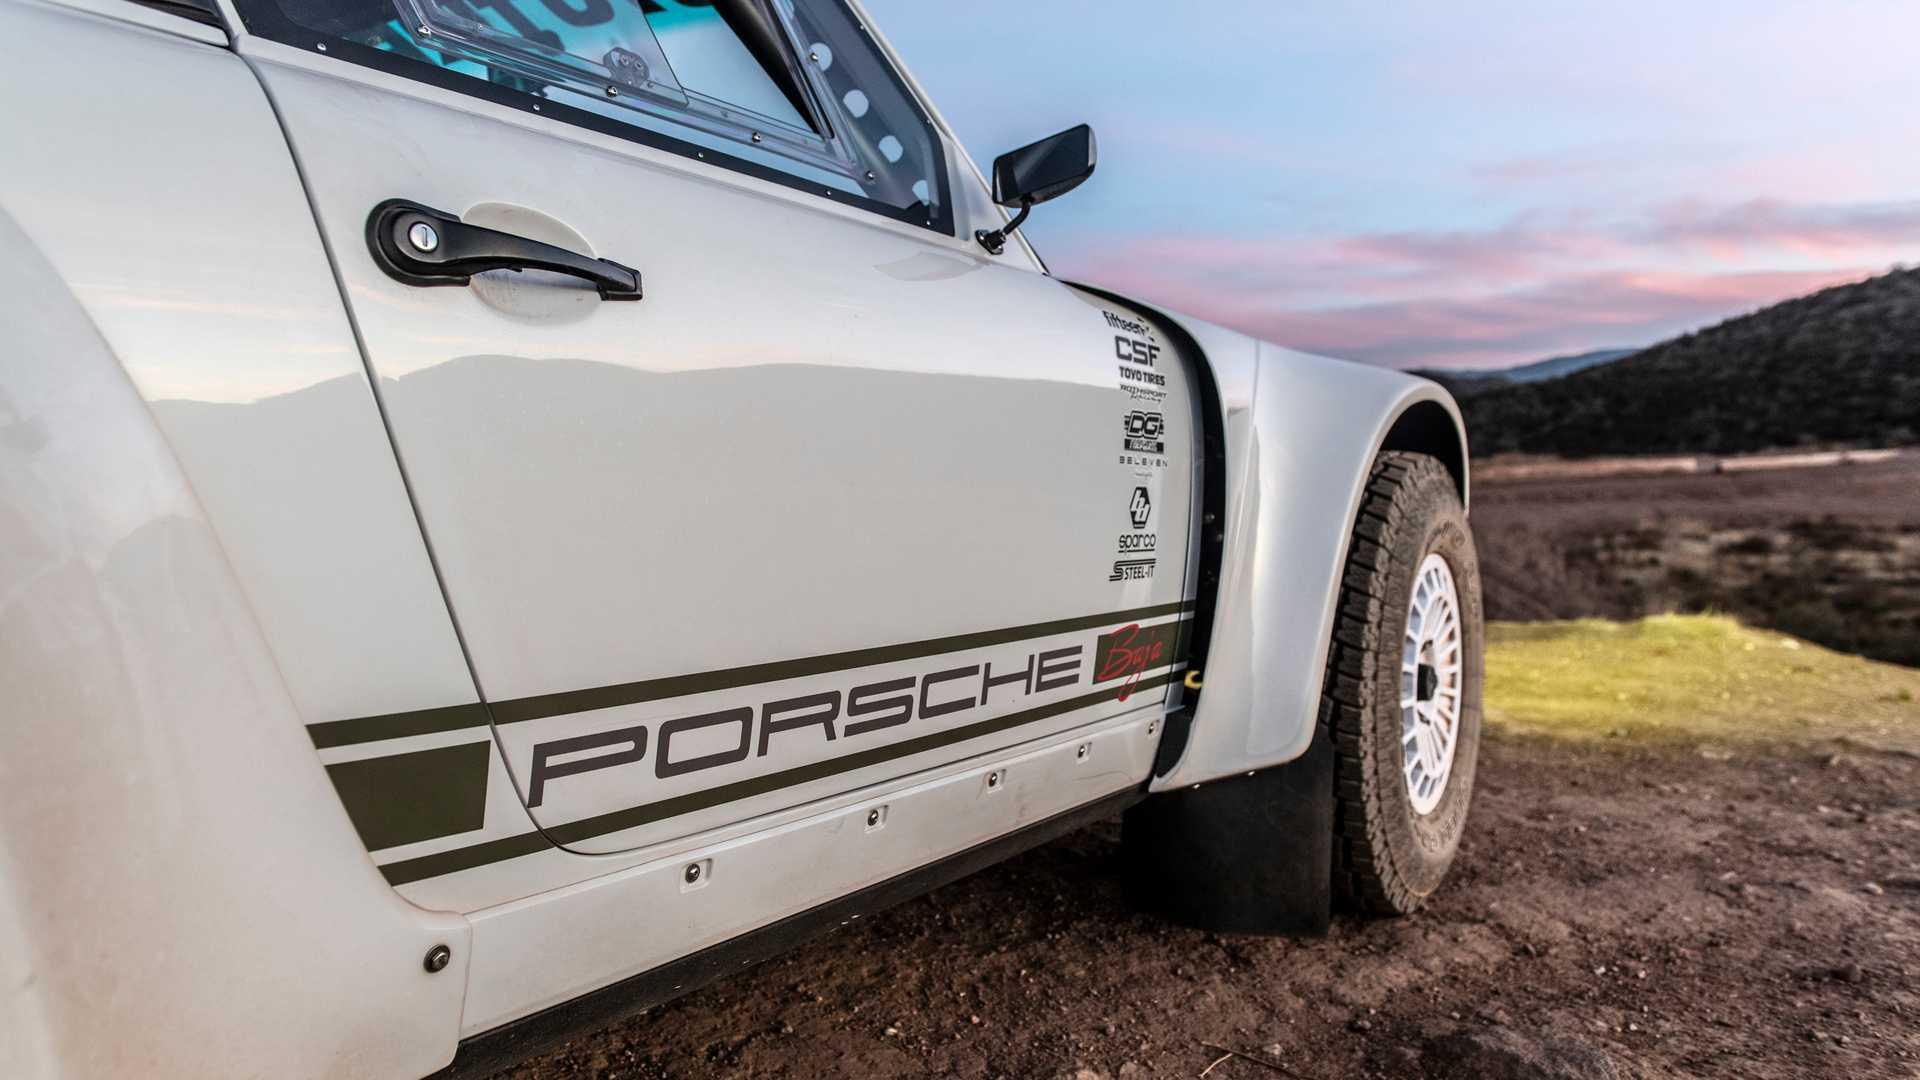 russell-built-fabrications-911-baja-2019-12-21T223328.244